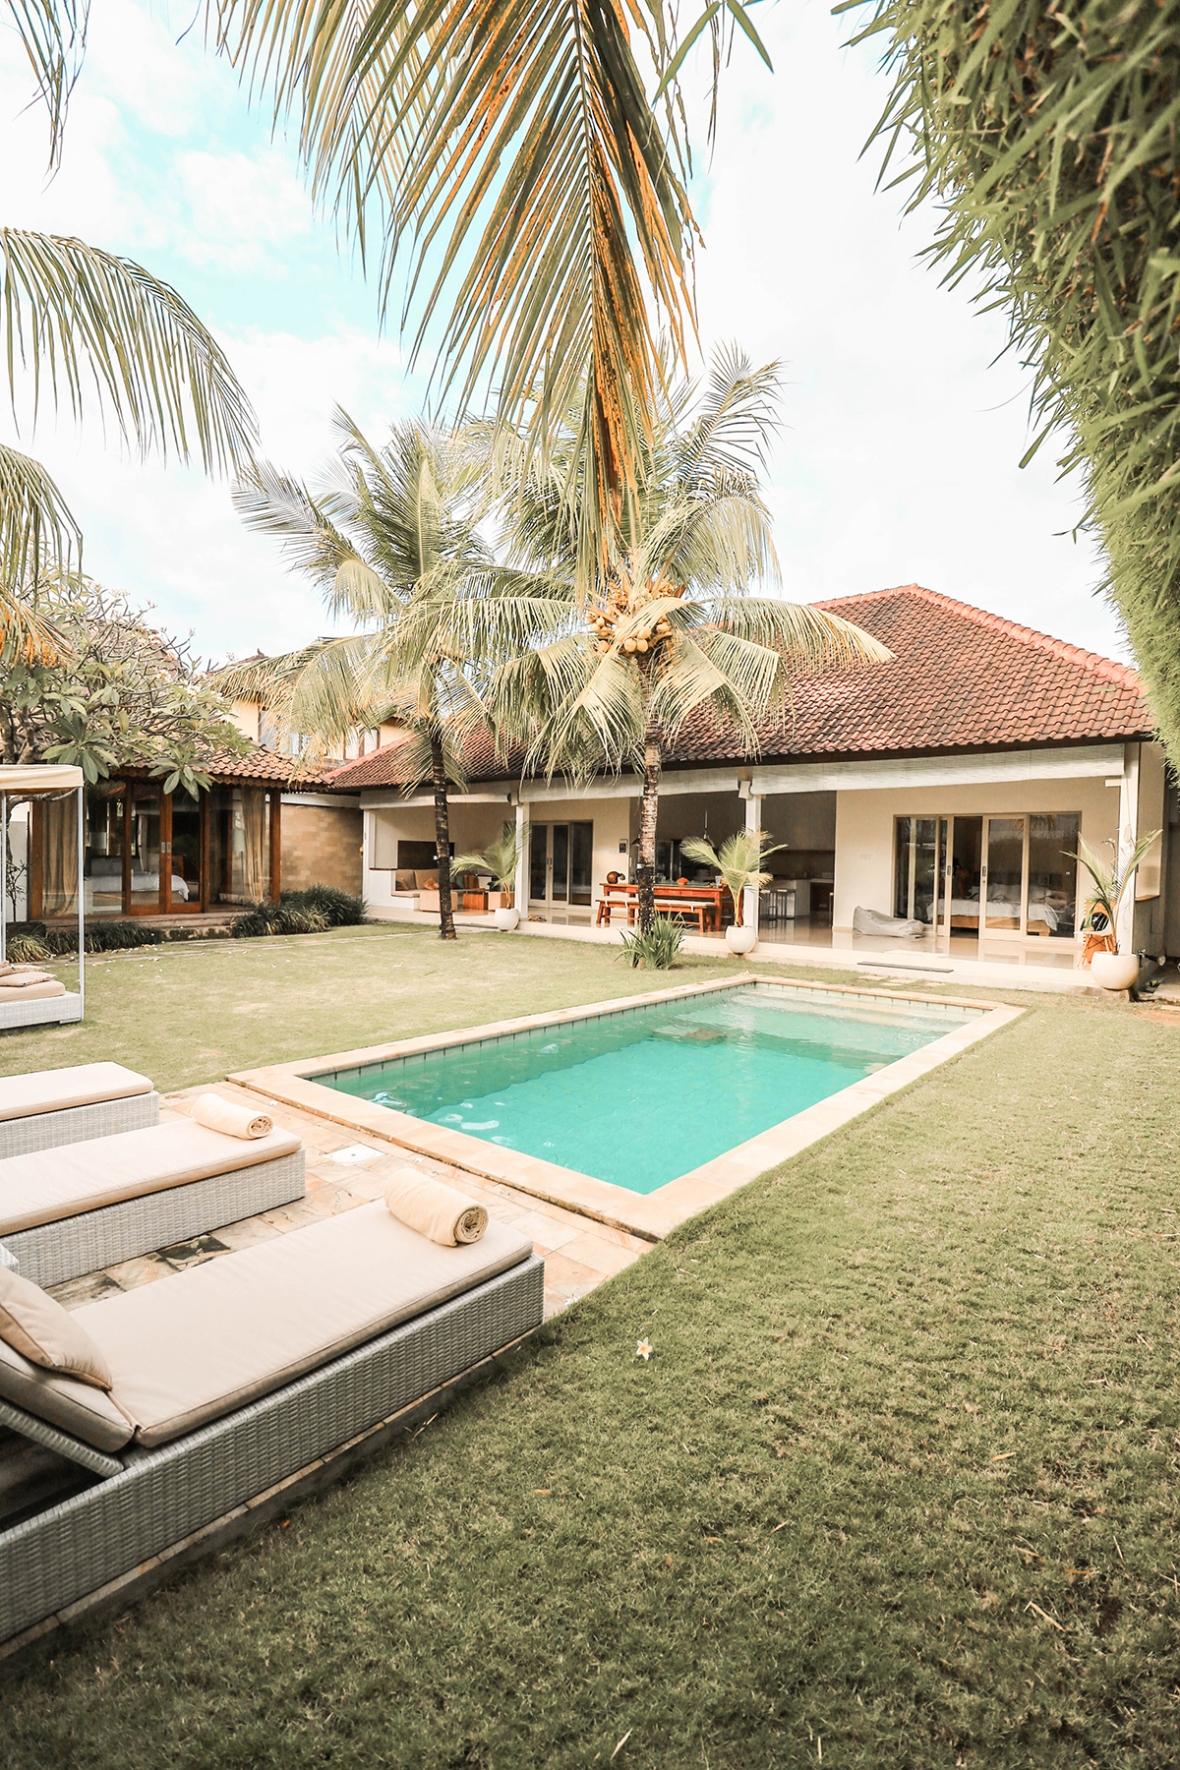 Sahana Villas Review travelblogger Merel Bali Seminyak